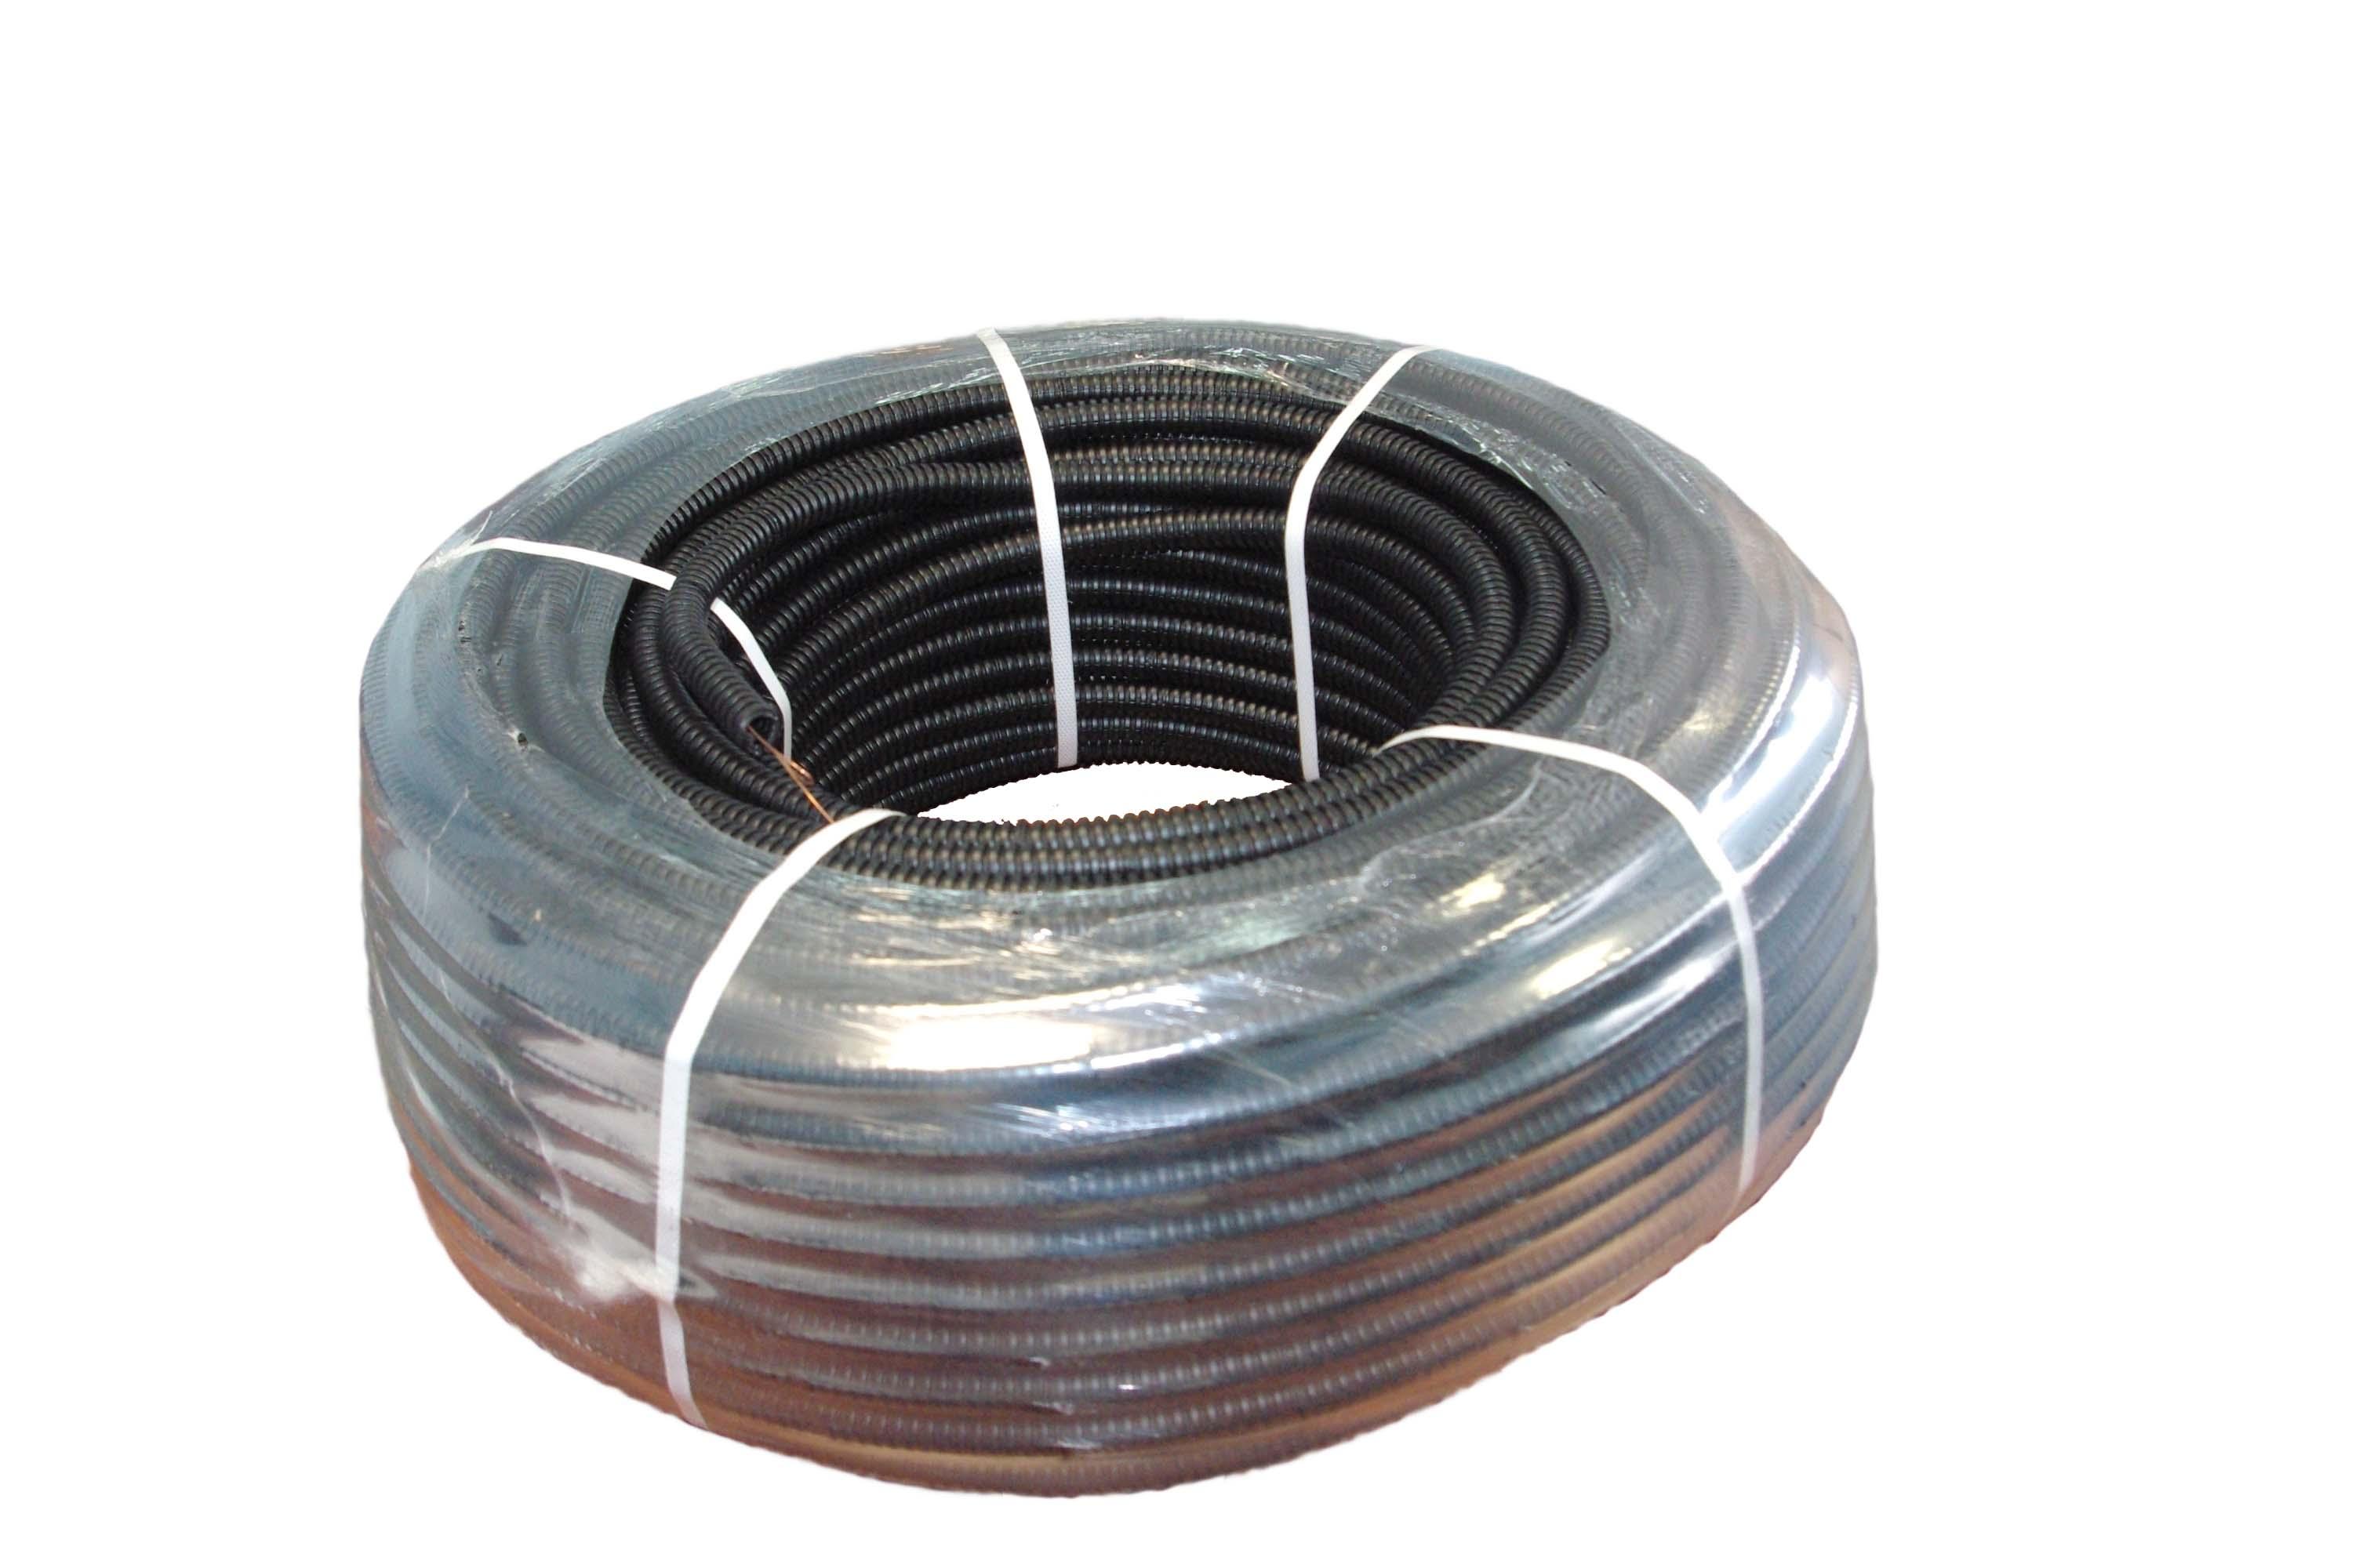 Труба СТССистемы канализации<br>Диаметр арматуры: 50,<br>Назначение арматуры: труба,<br>Длина (мм): 15000<br>